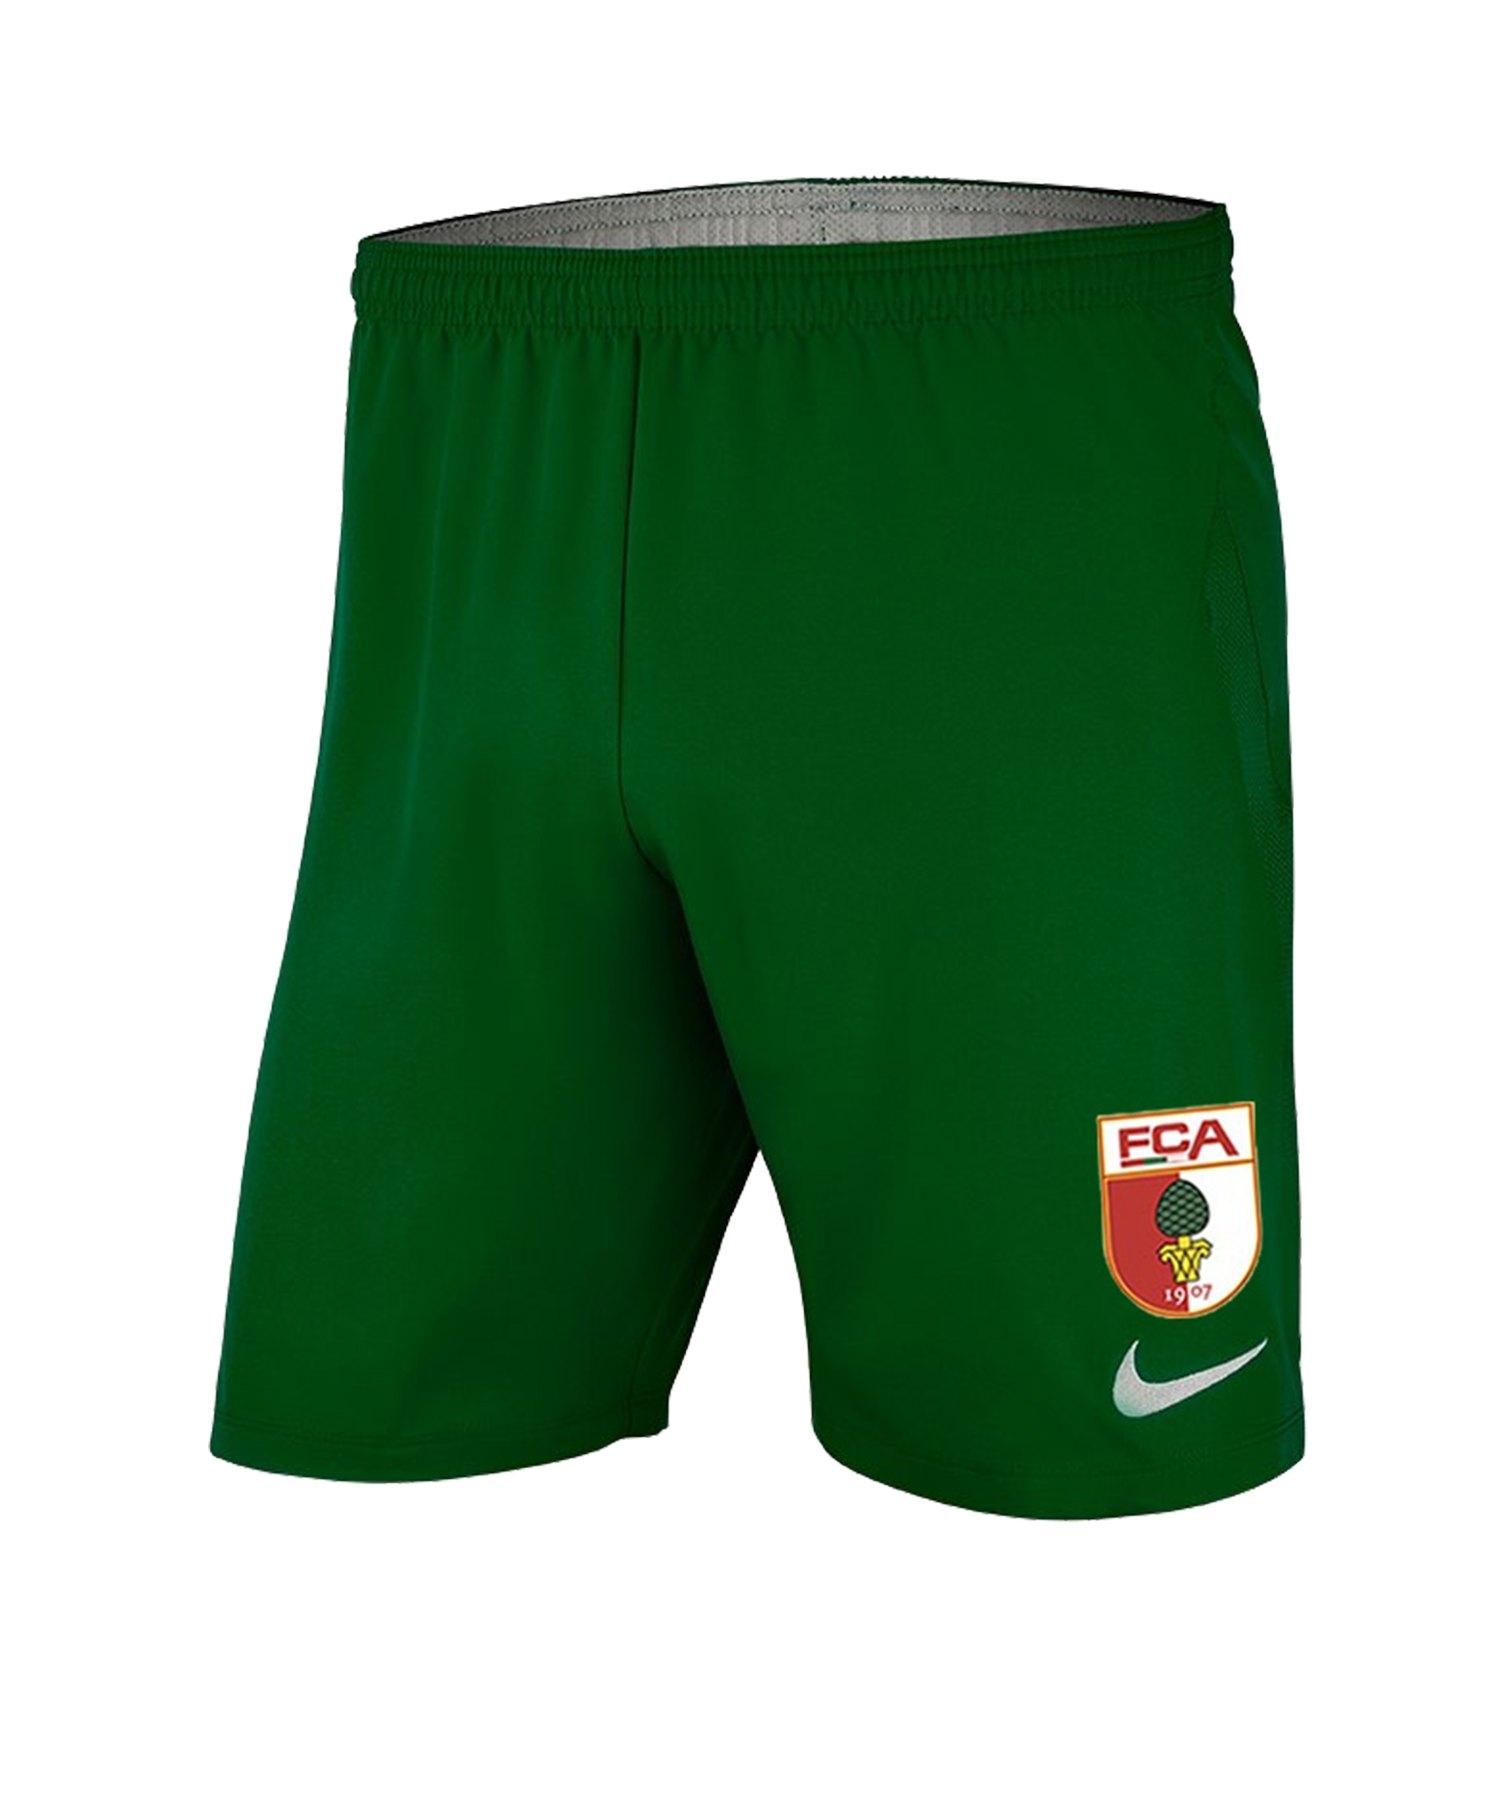 Nike FC Augsburg Short Home 2019/2020 Grün F302 - gruen